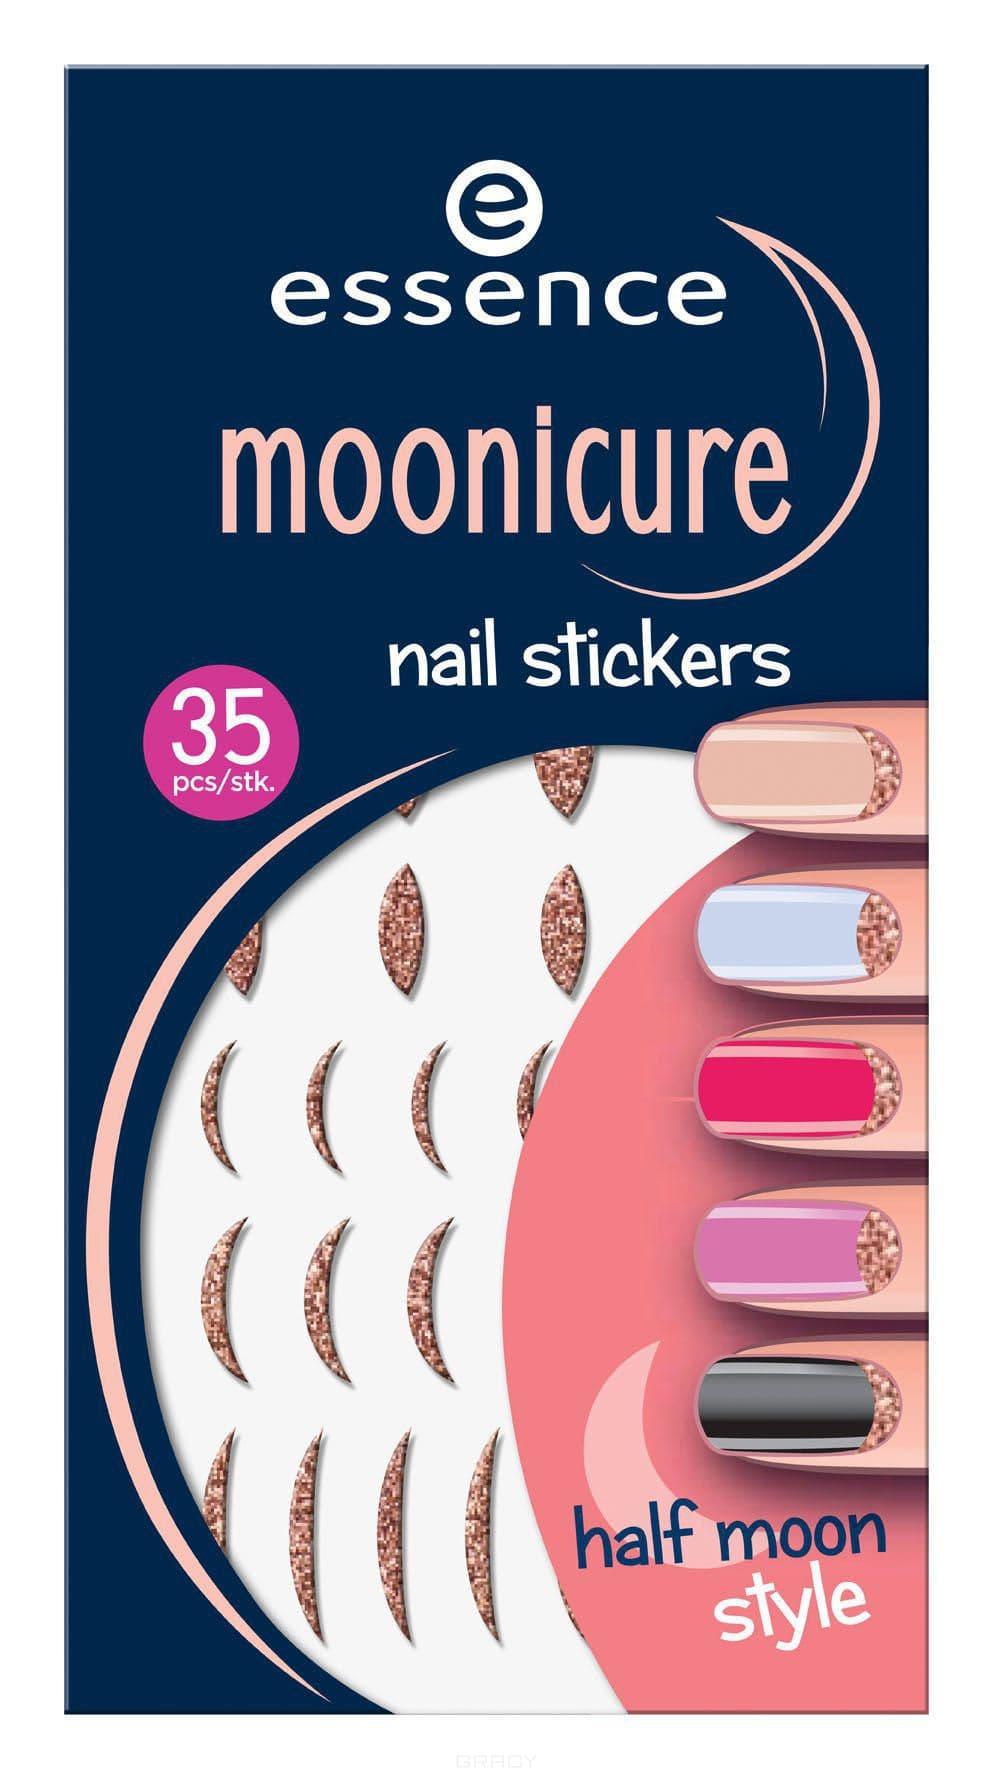 Наклейки для лунного маникюра Moonicure Nail Stickers cute nail art stickers black 5 pack